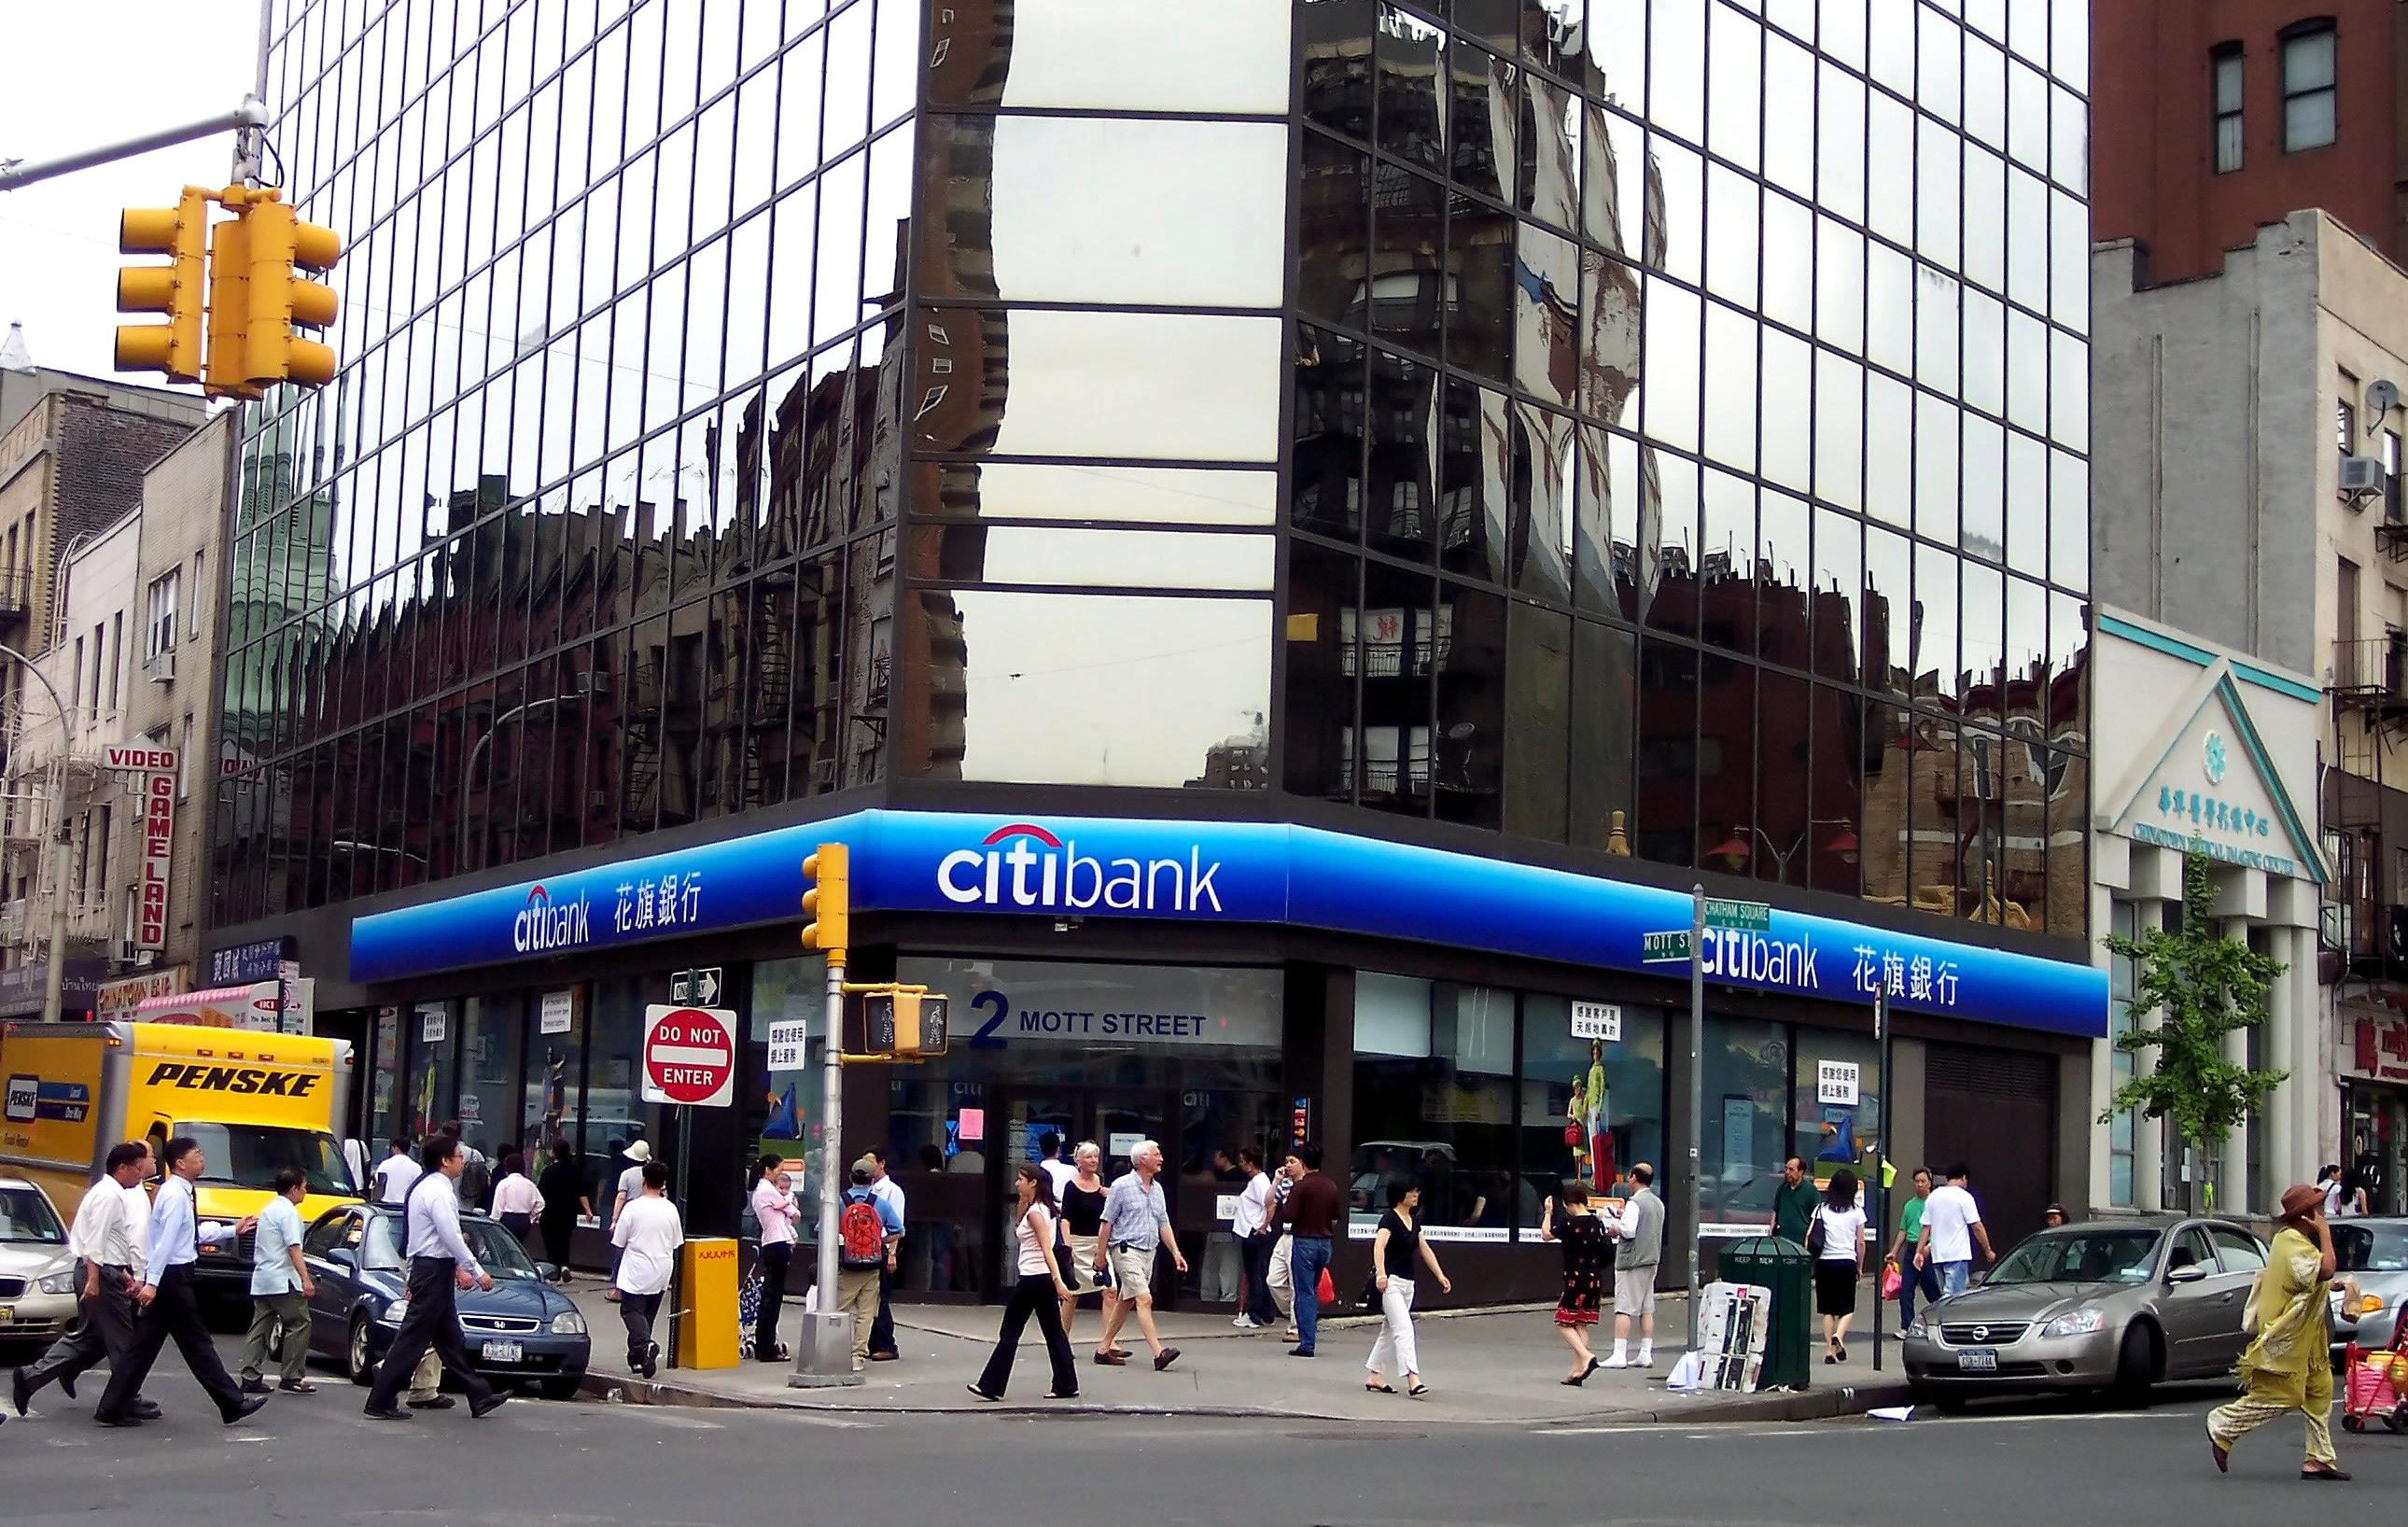 Citibank_Chinatown.jpg#asset:222